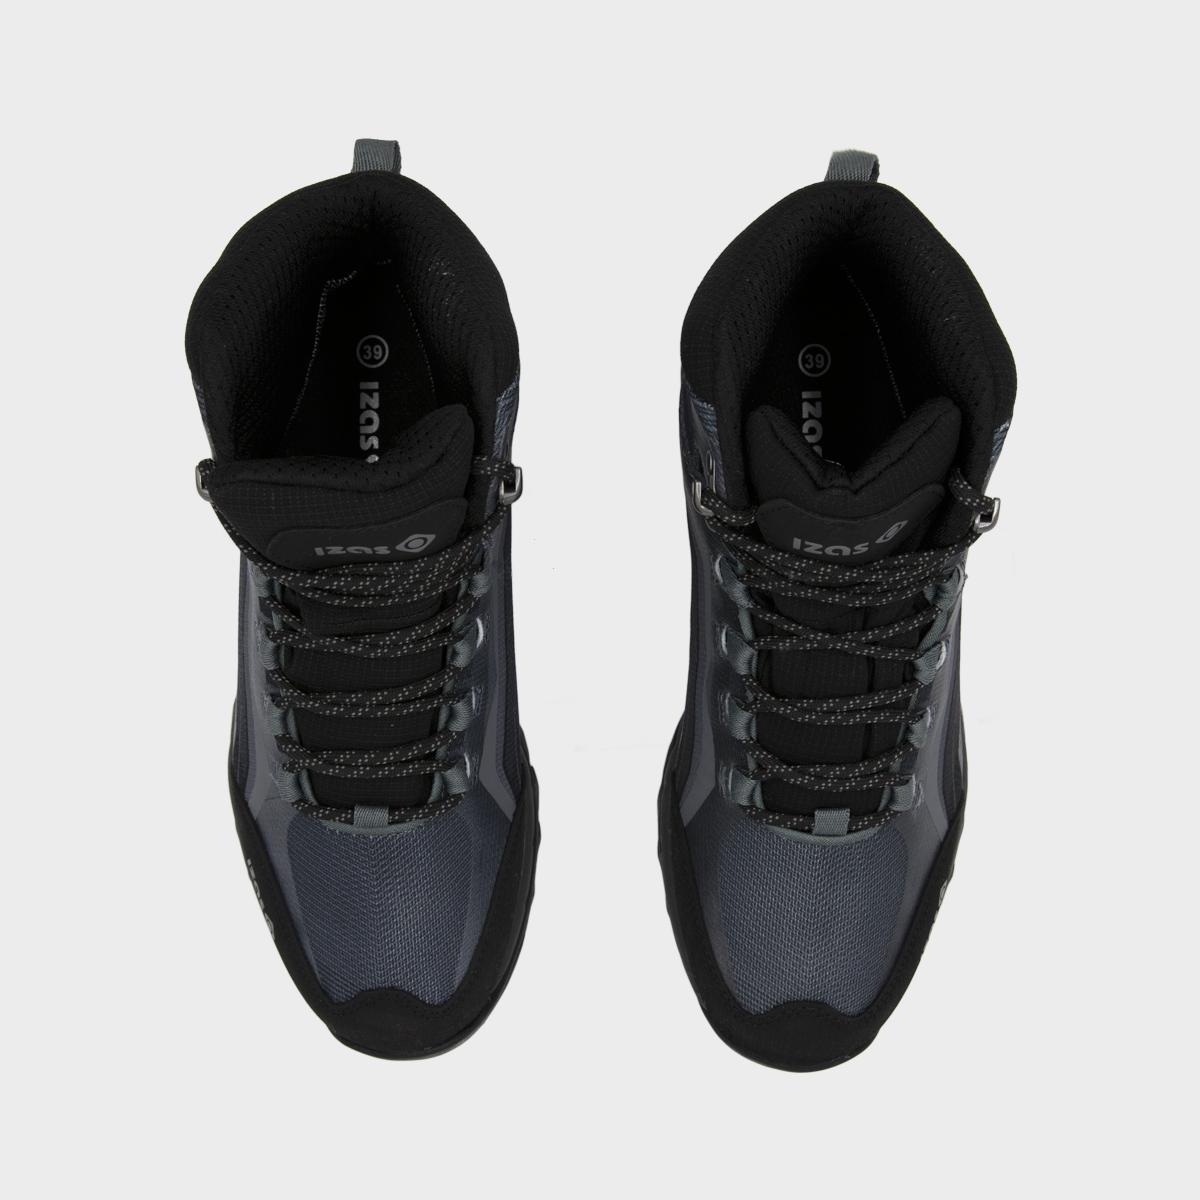 GORET BLACK/CHARCOAL MAN'S